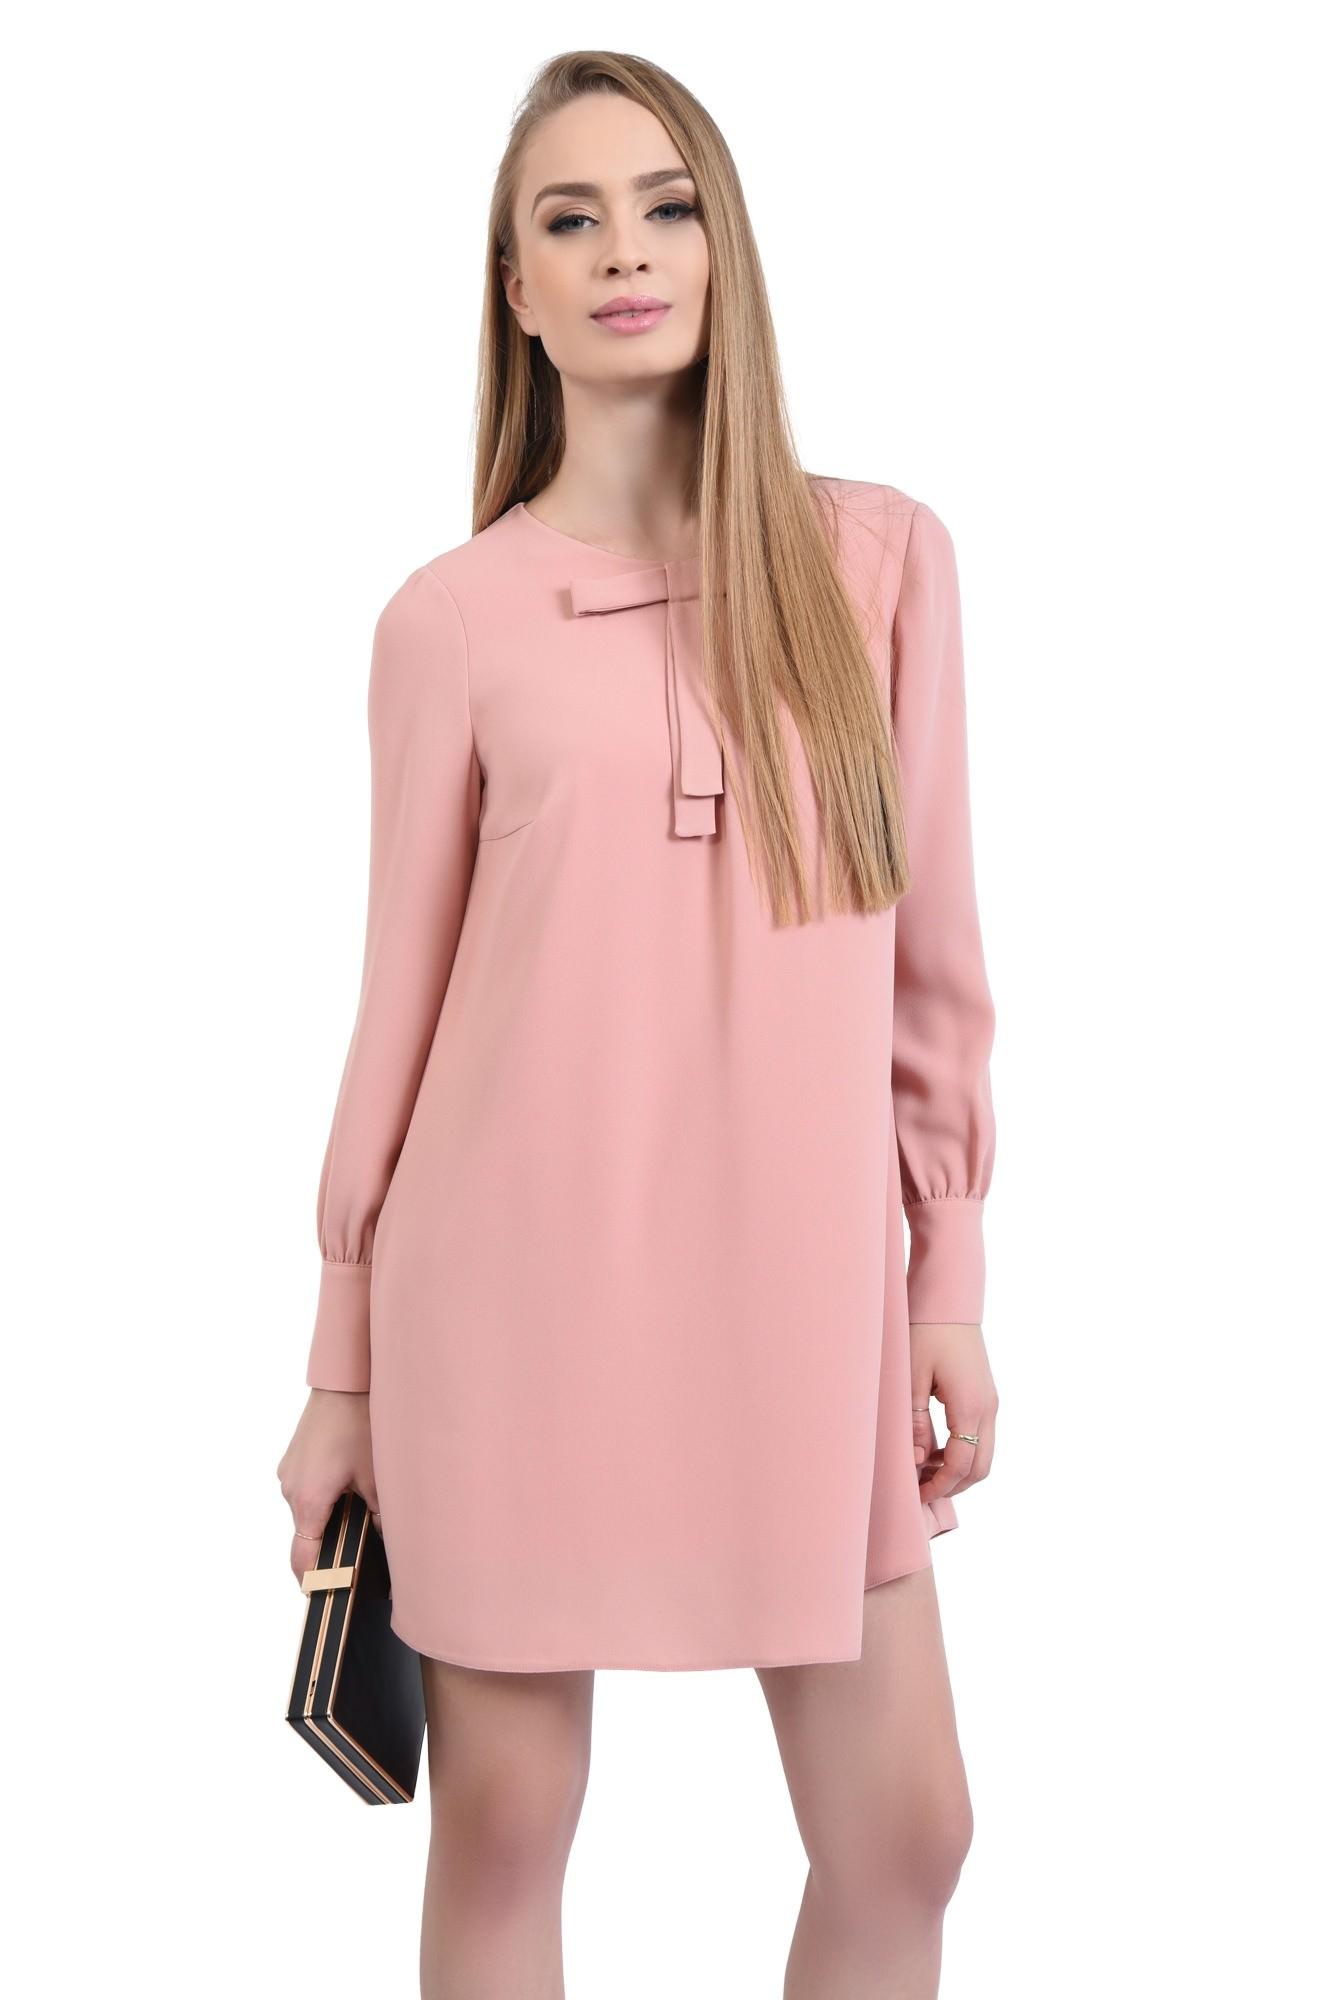 0 - Rochie de zi scurta, roz